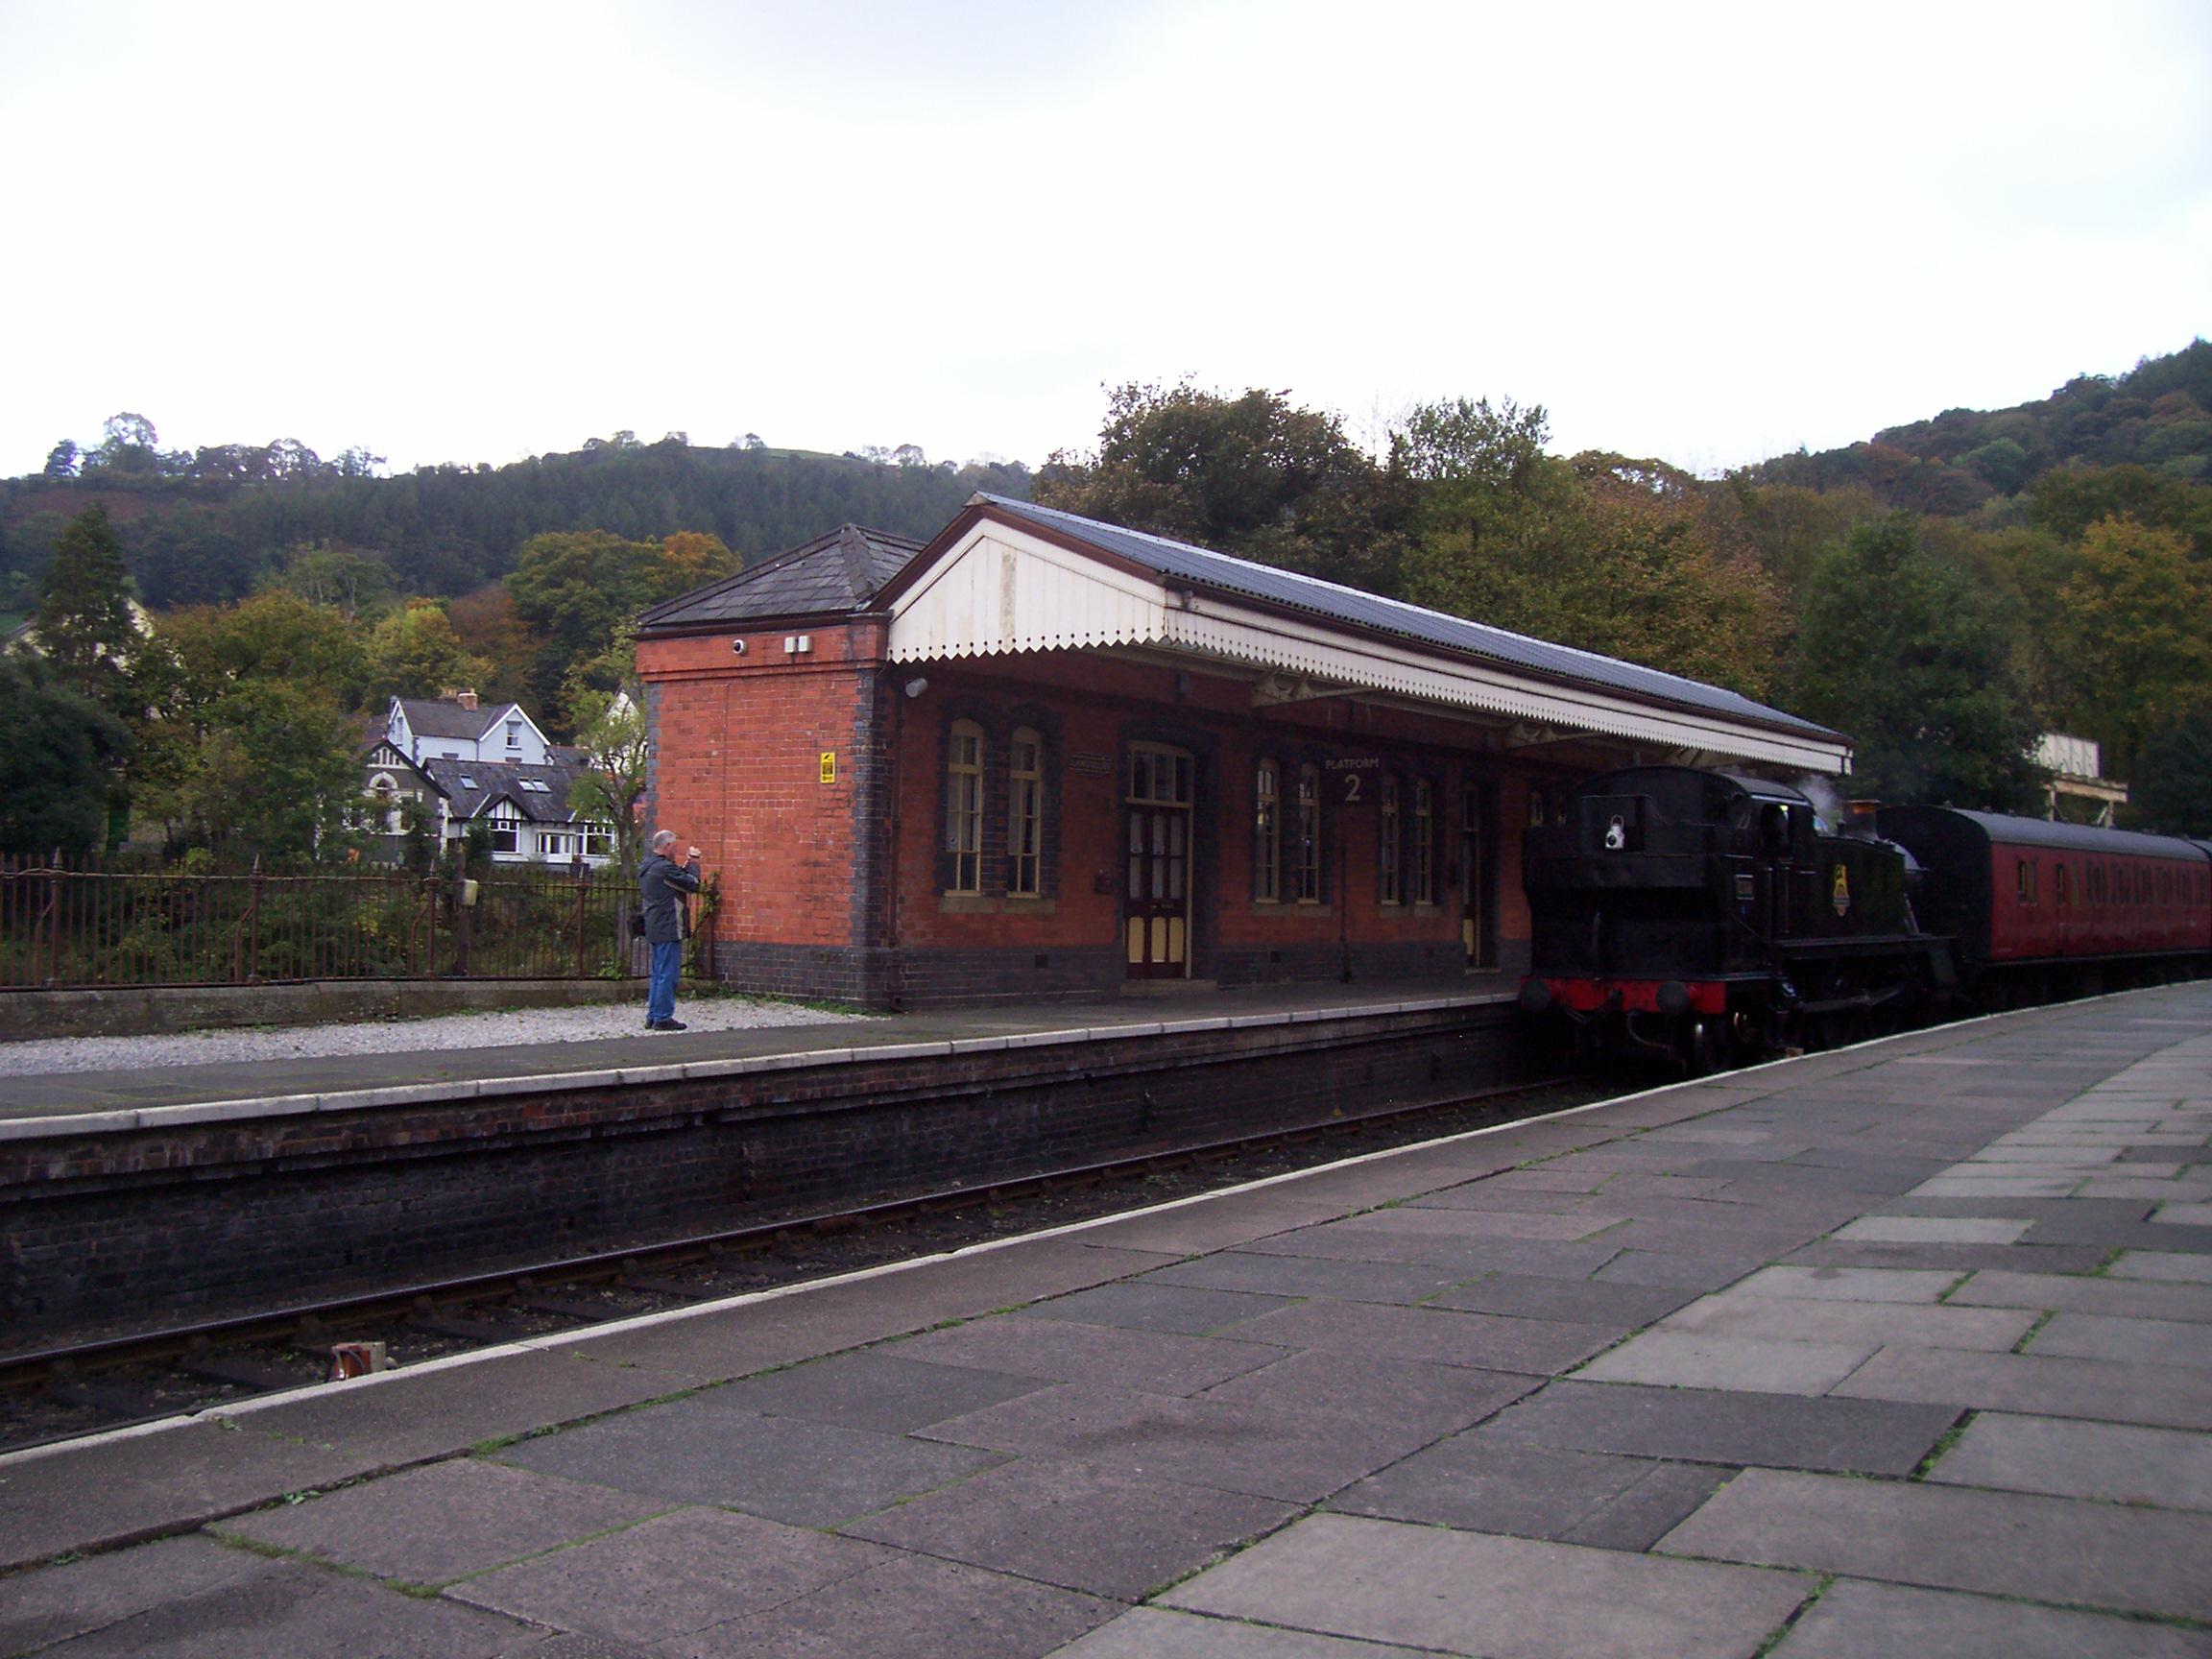 Platform 2 Llangollen